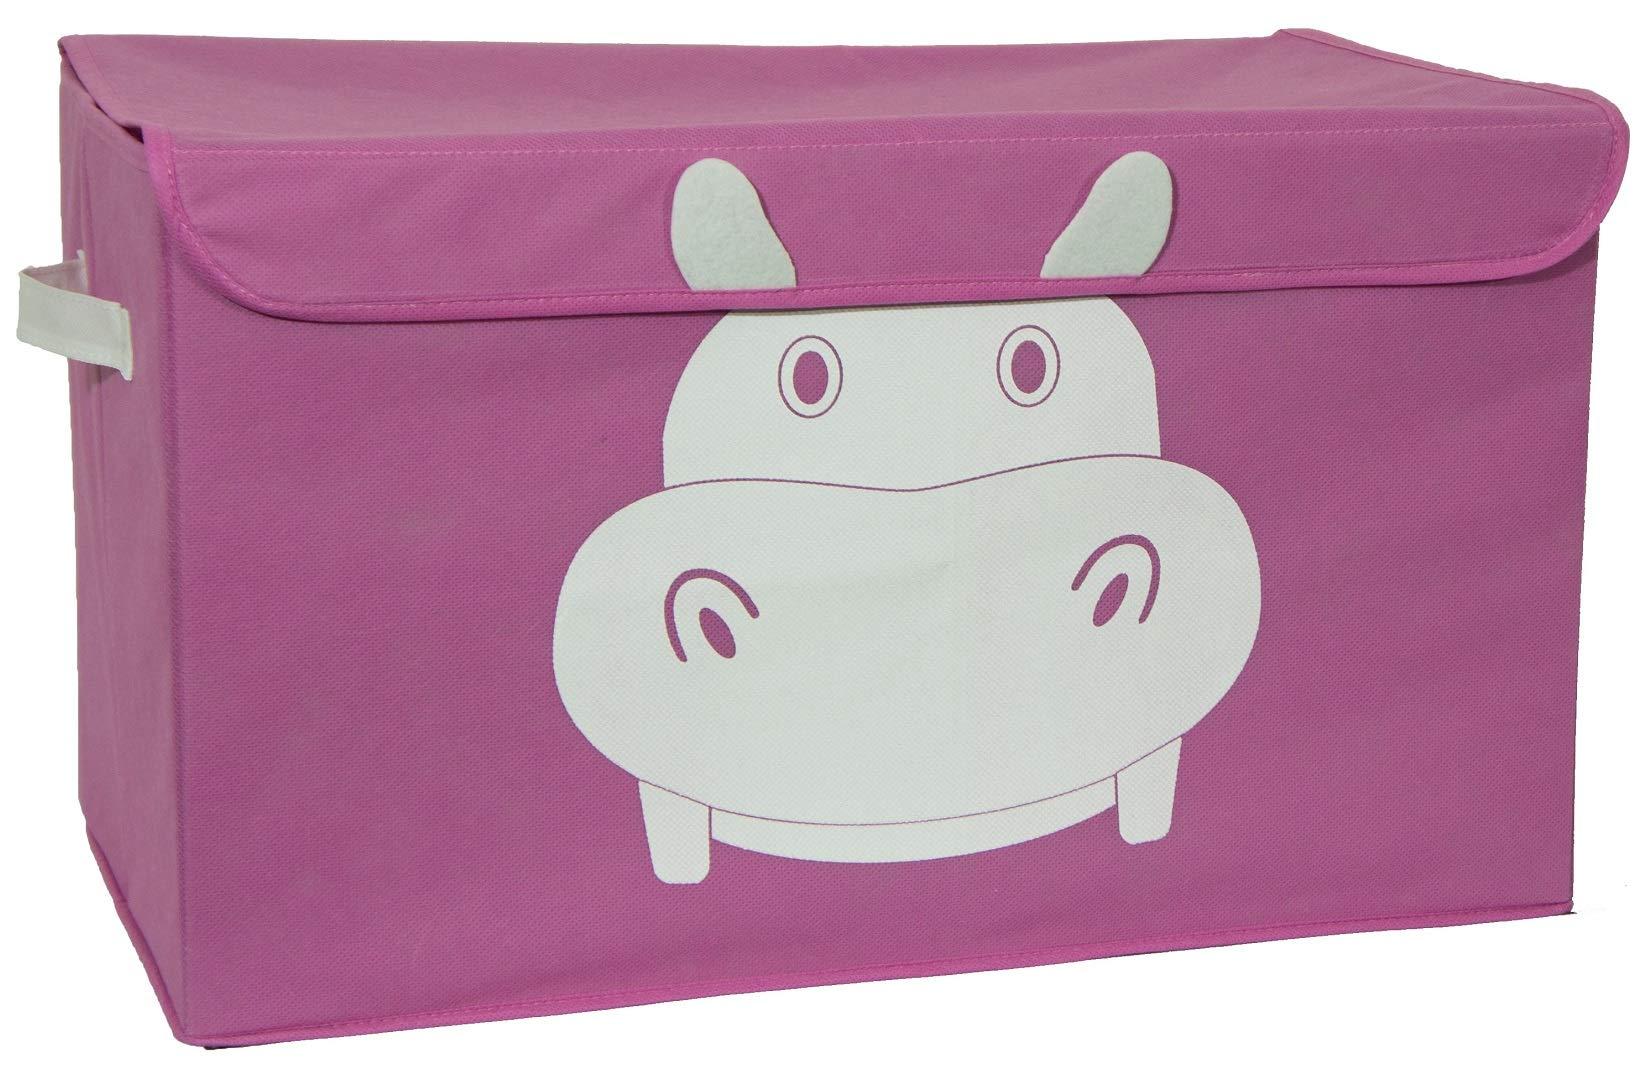 Cute Animal Collapsible Toy Storage Organizer Folding: Amazon.com : Katabird Storage Bin For Toy Storage